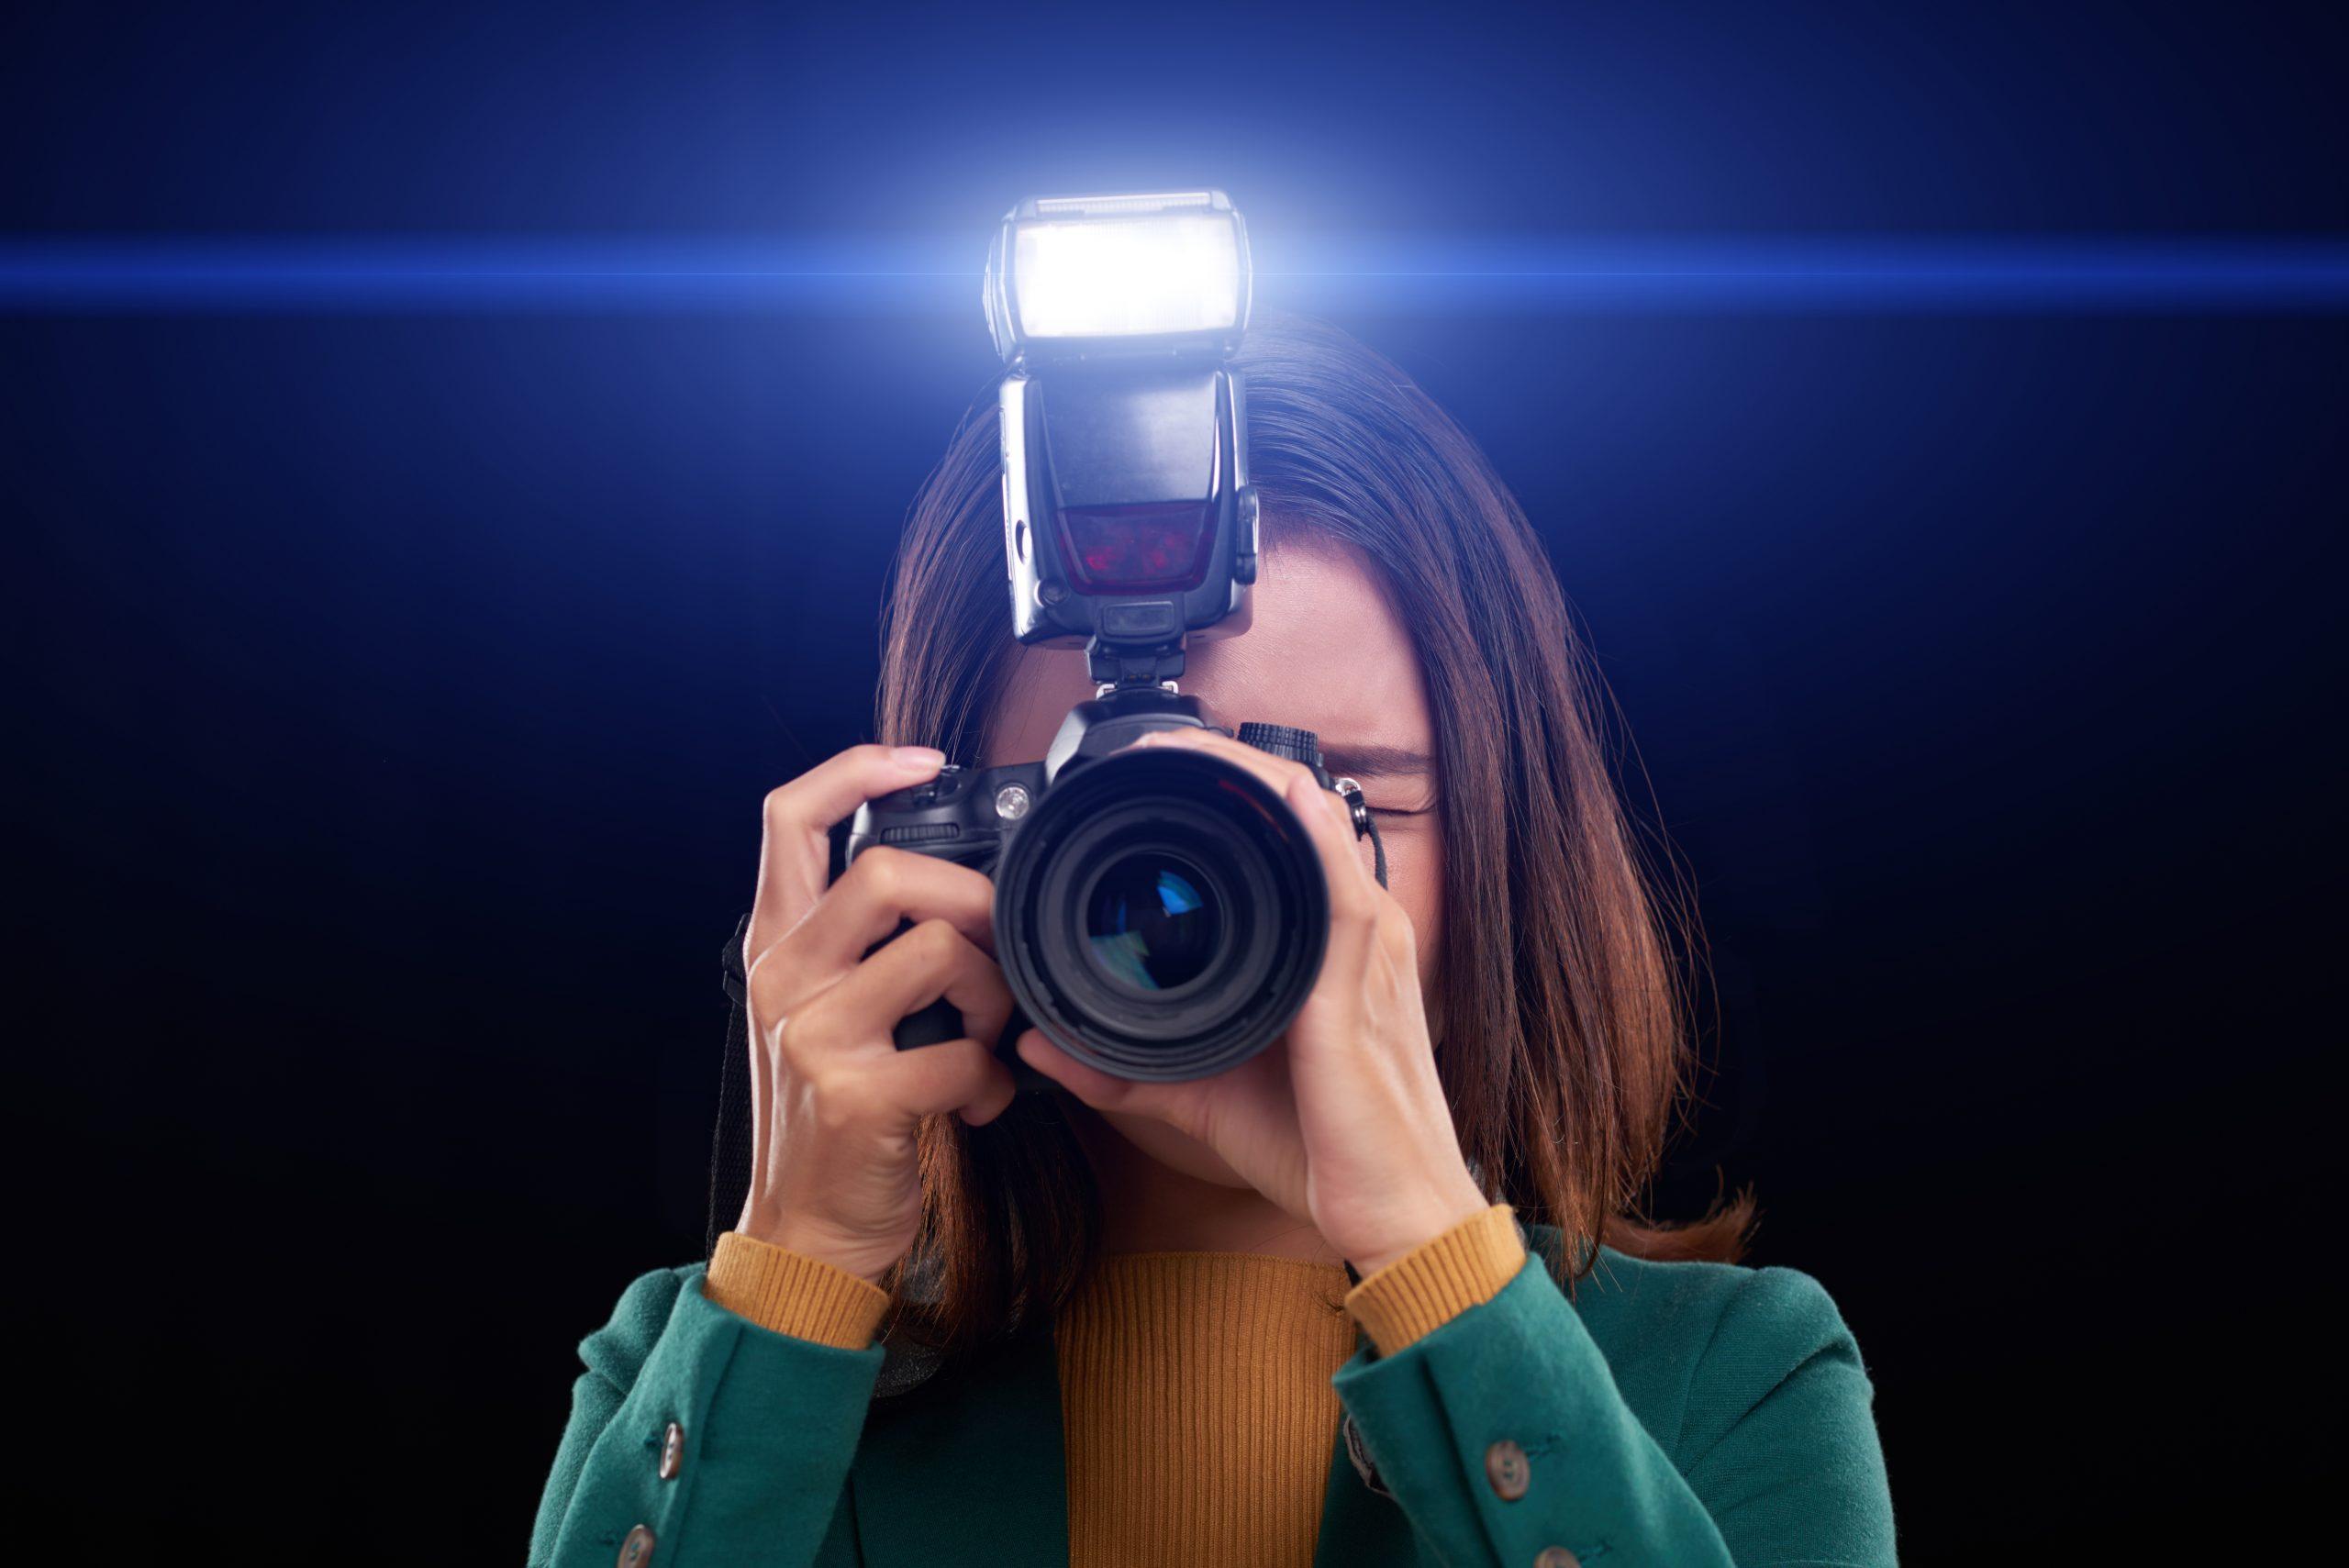 flash fotografia stock